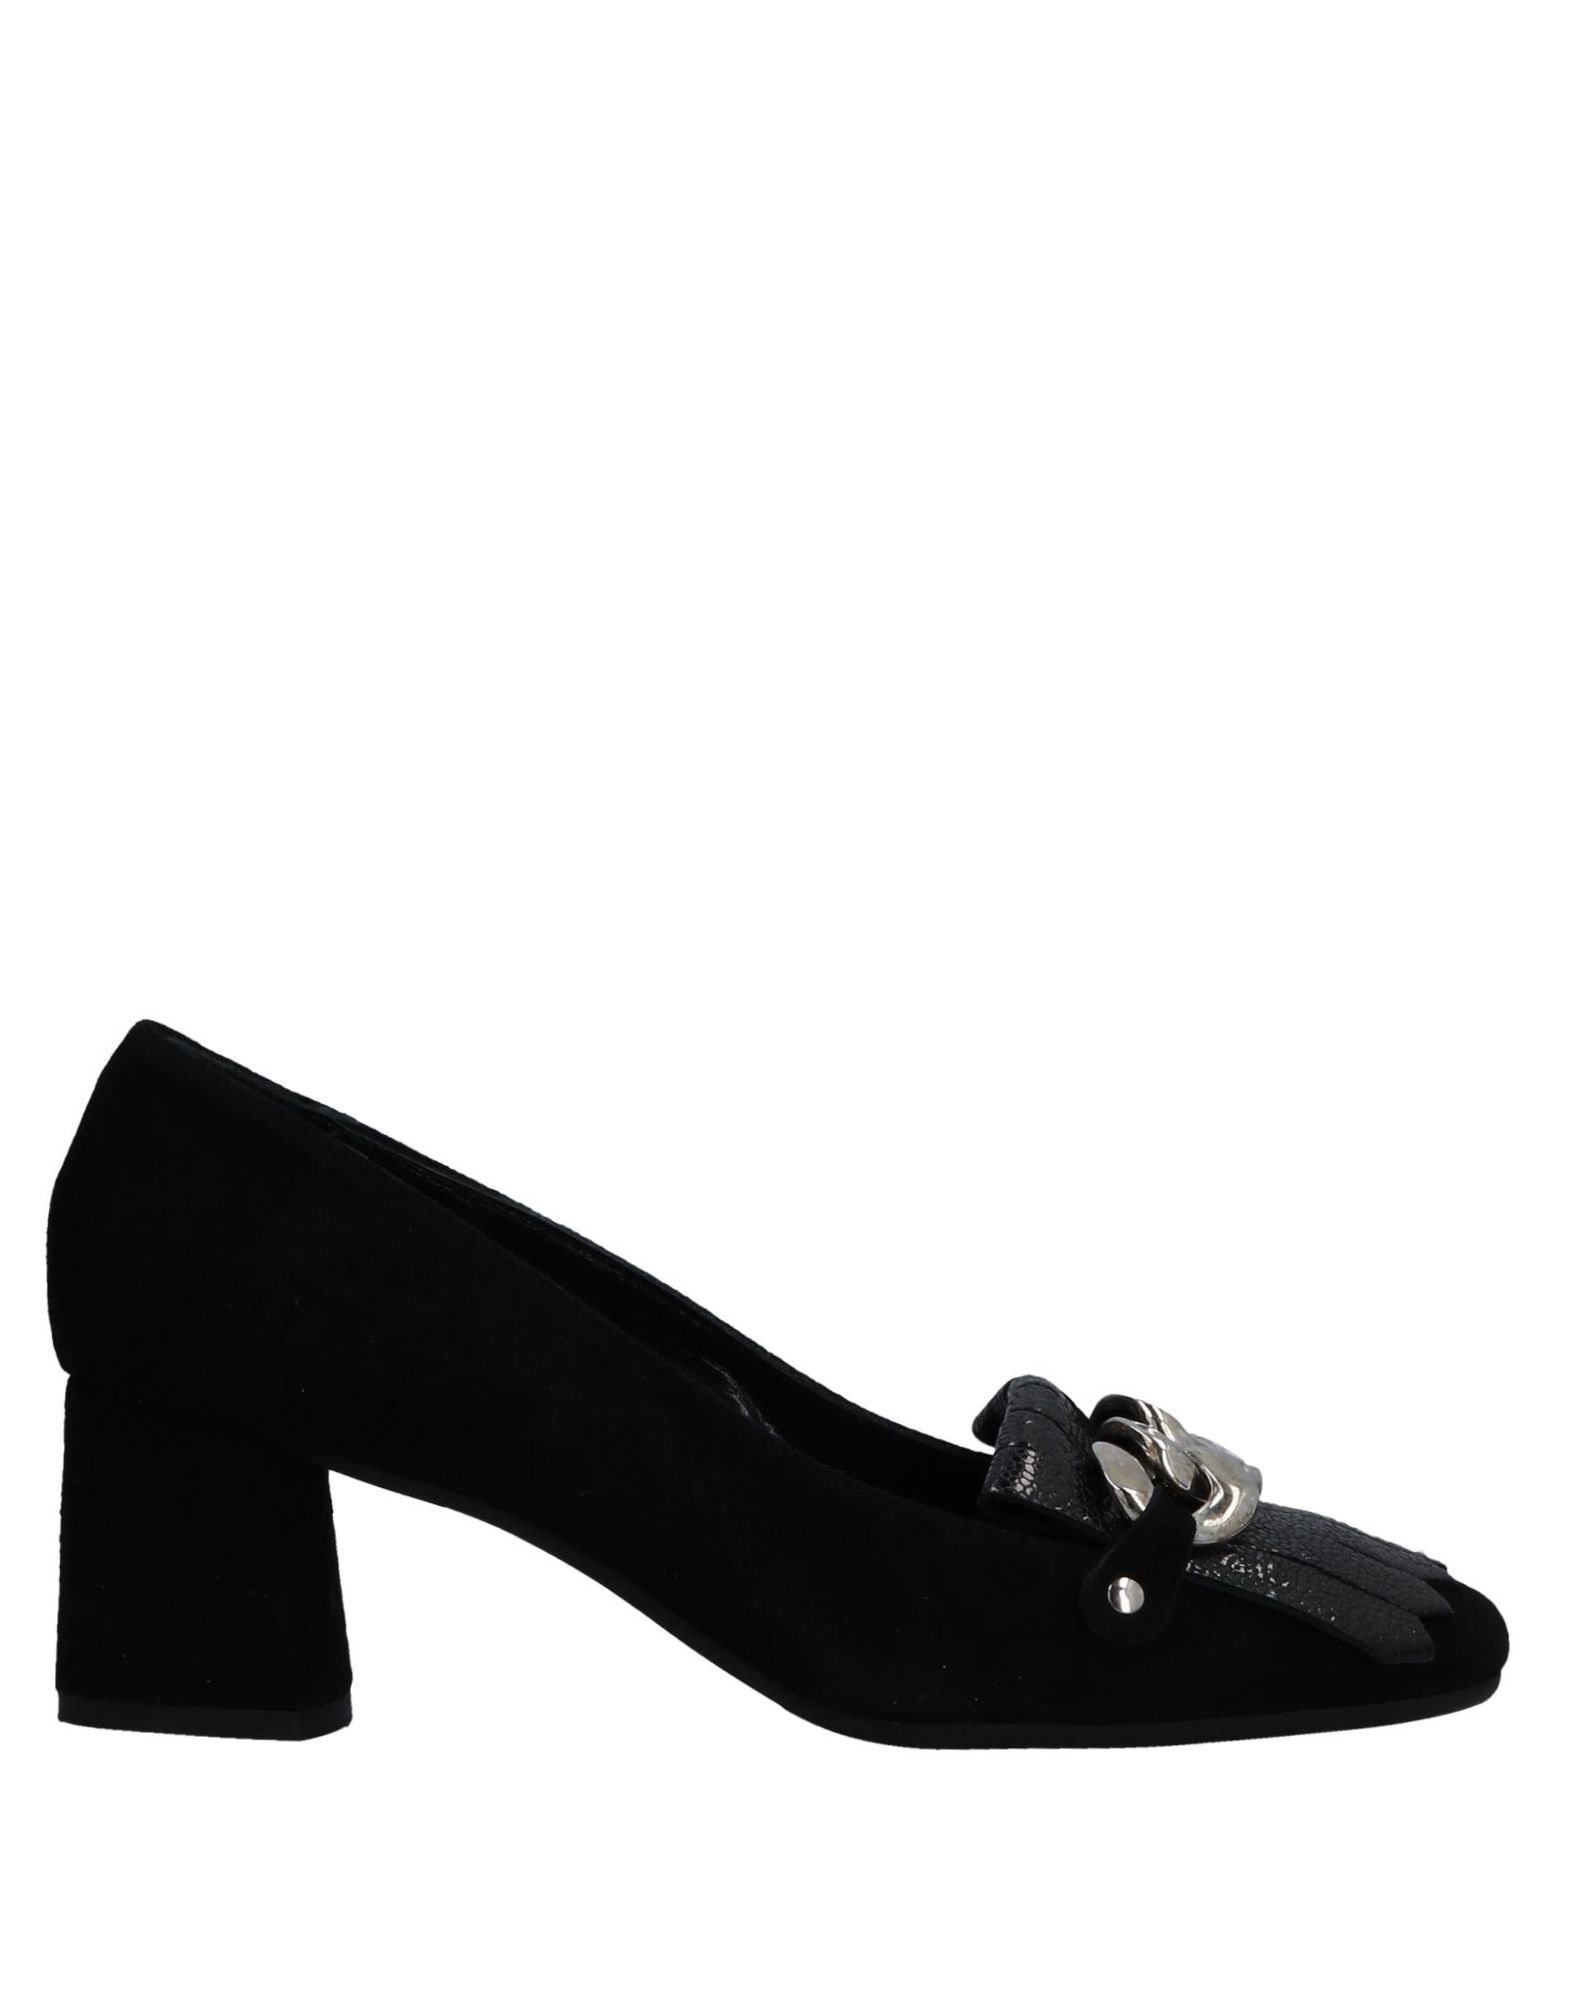 Andrea Morando Morando Loafers - Women Andrea Morando Morando Loafers online on  Australia - 11525282MW 146276